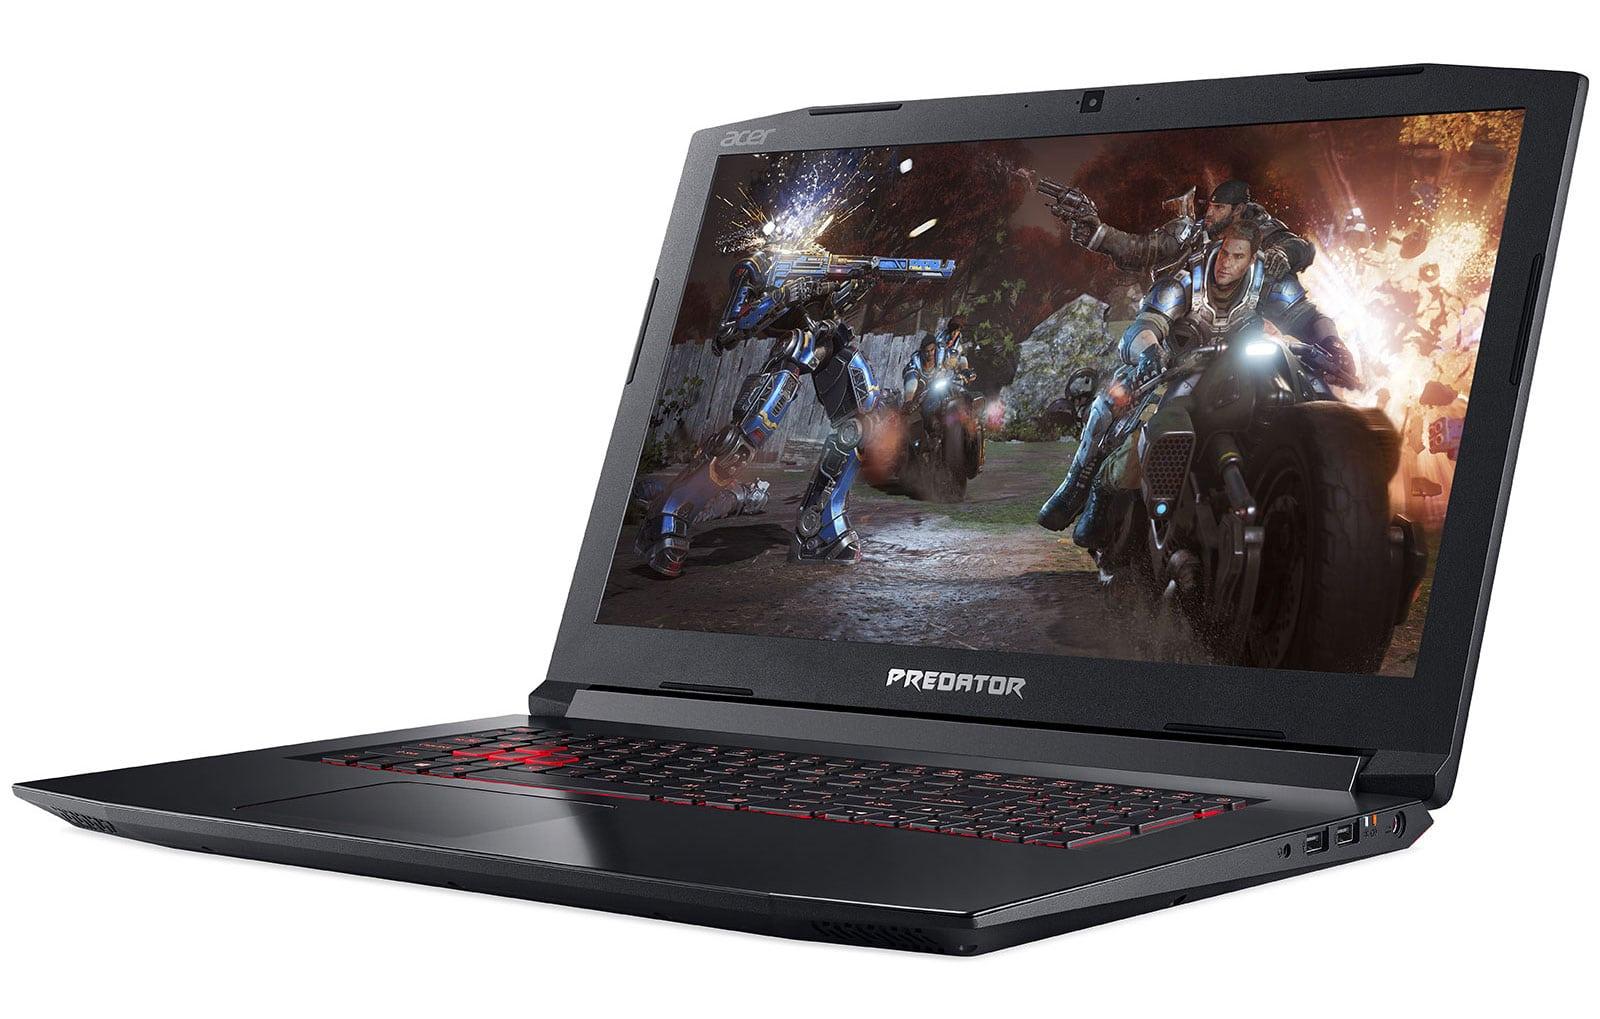 "Acer Predator PH317-52-76Q9, gamer 17"" puissant (1359€)"